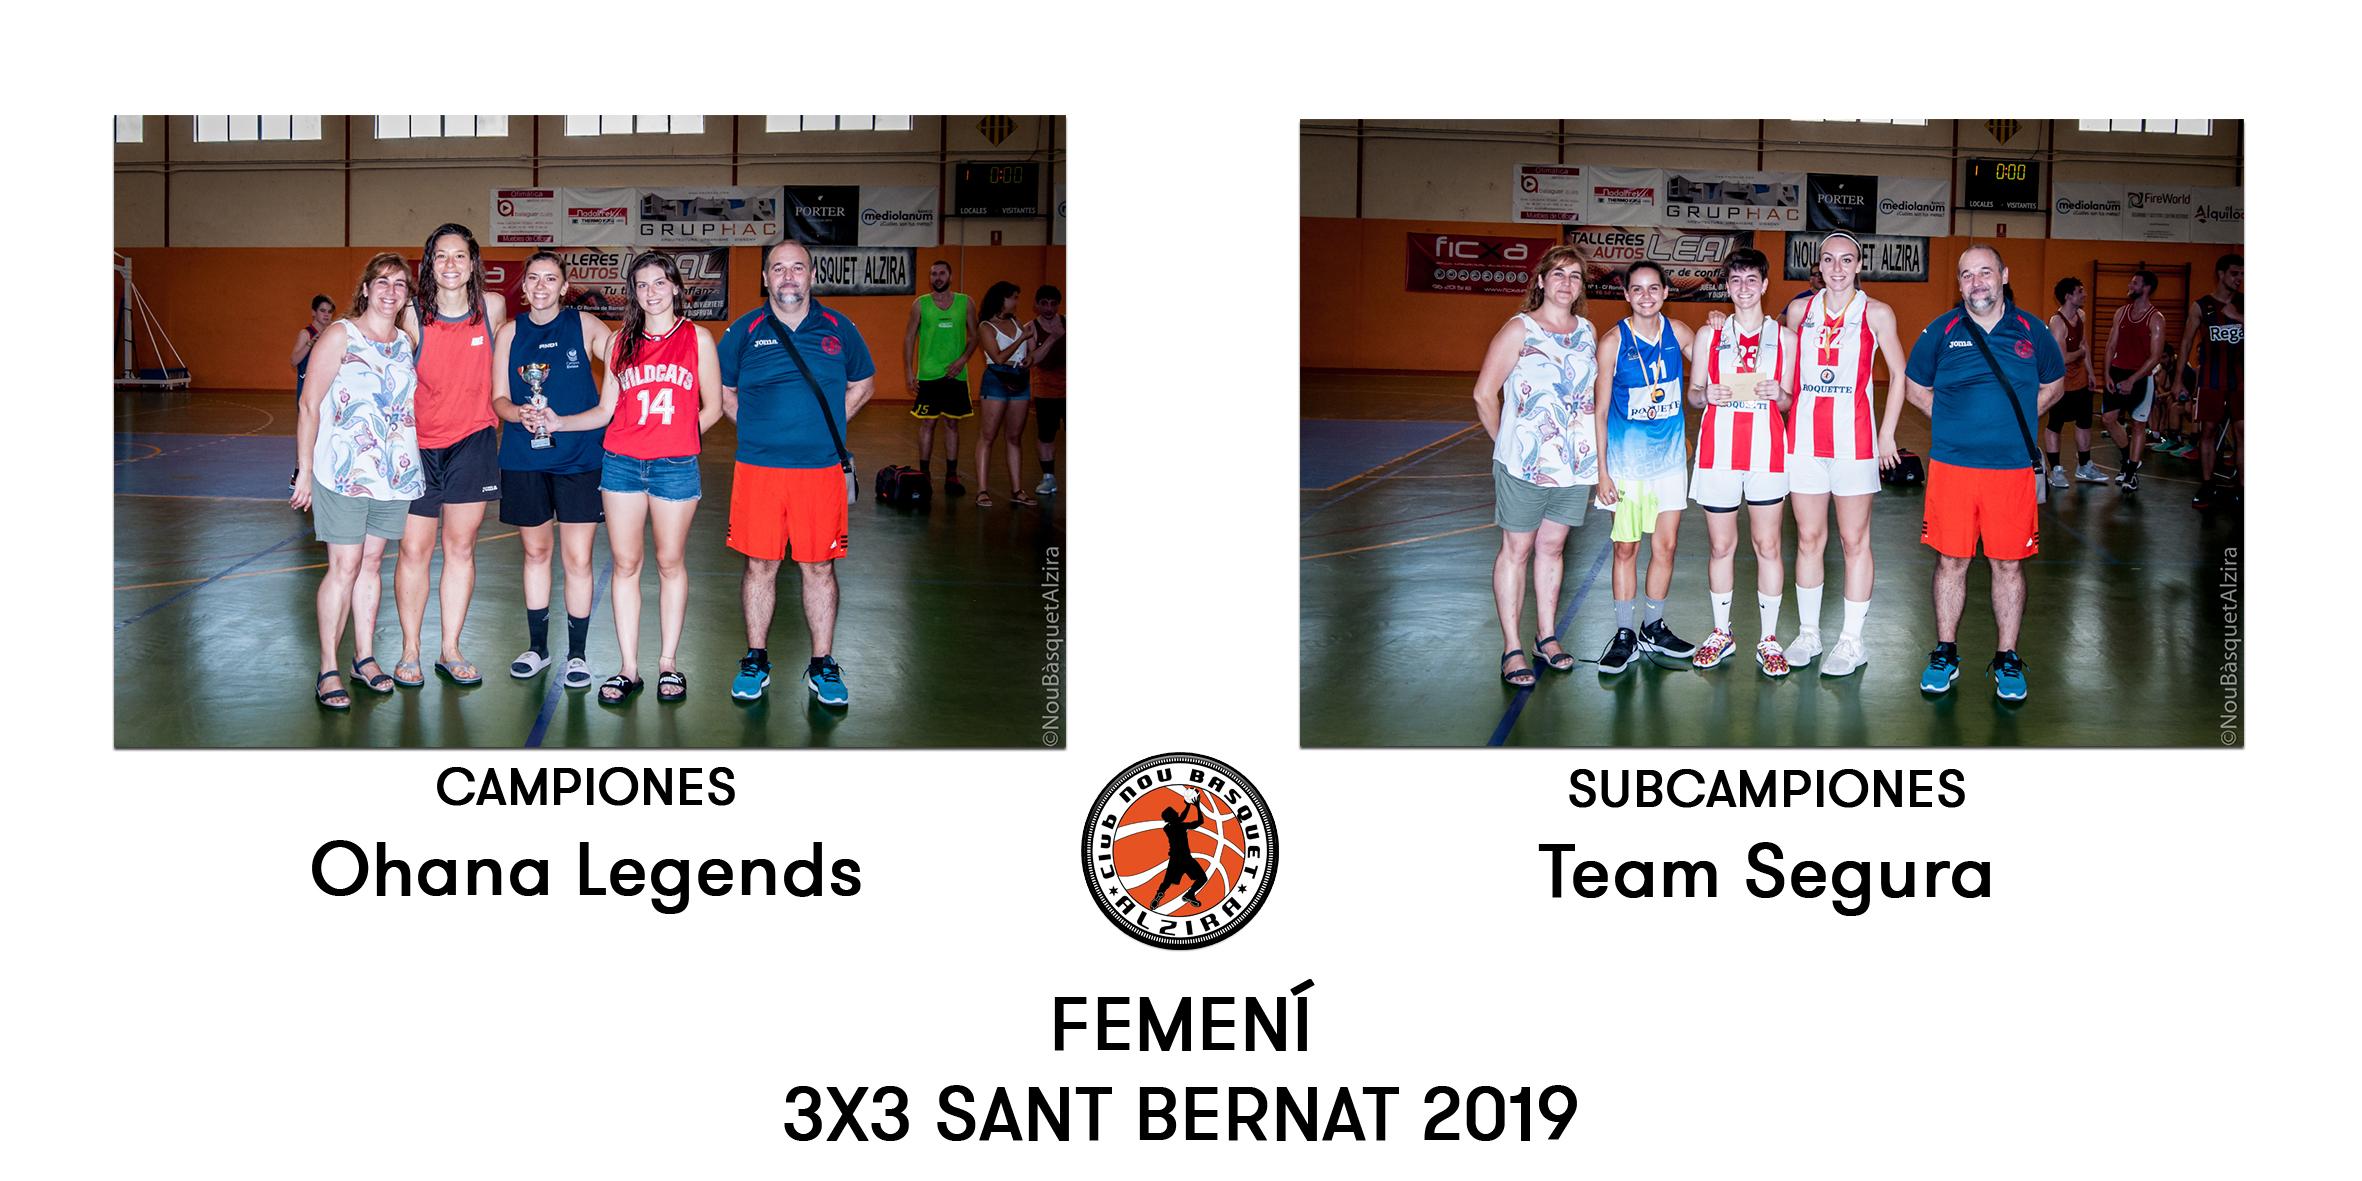 FEMENI-campions-3x3